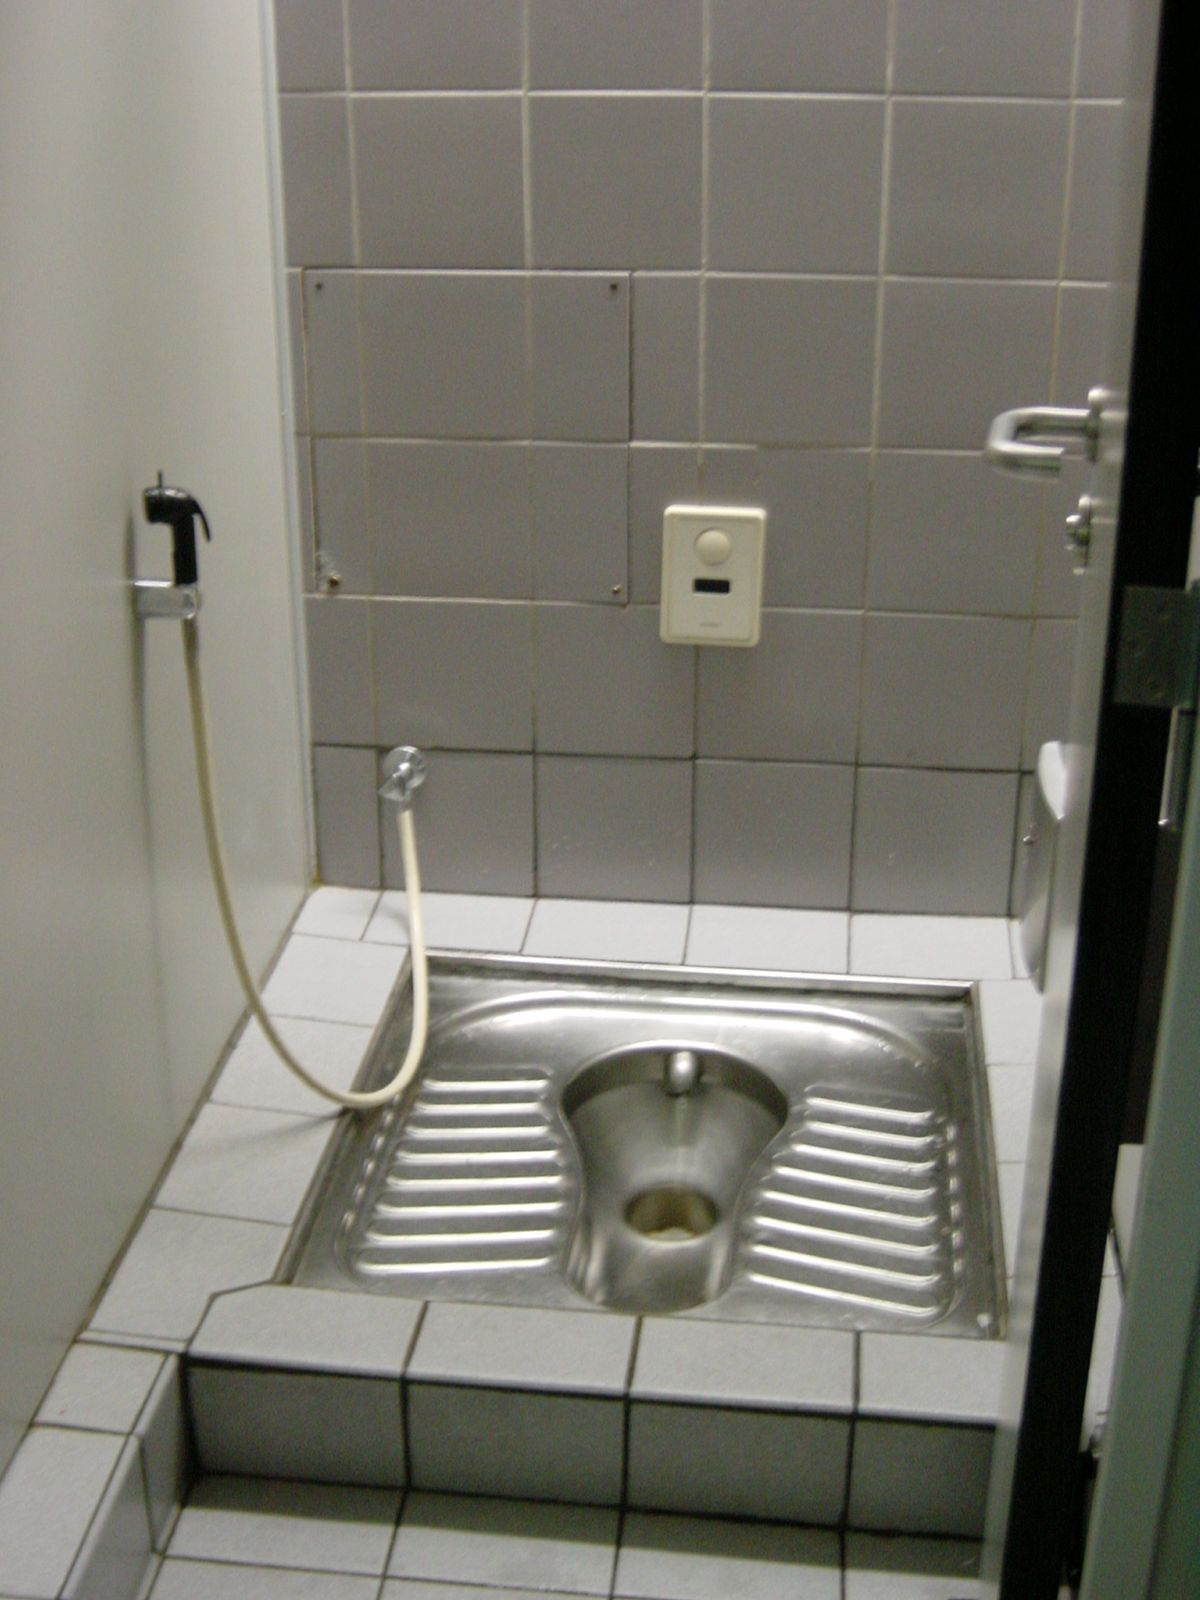 12 Toilet Oddities Around The World That Surprise Japan Toilet